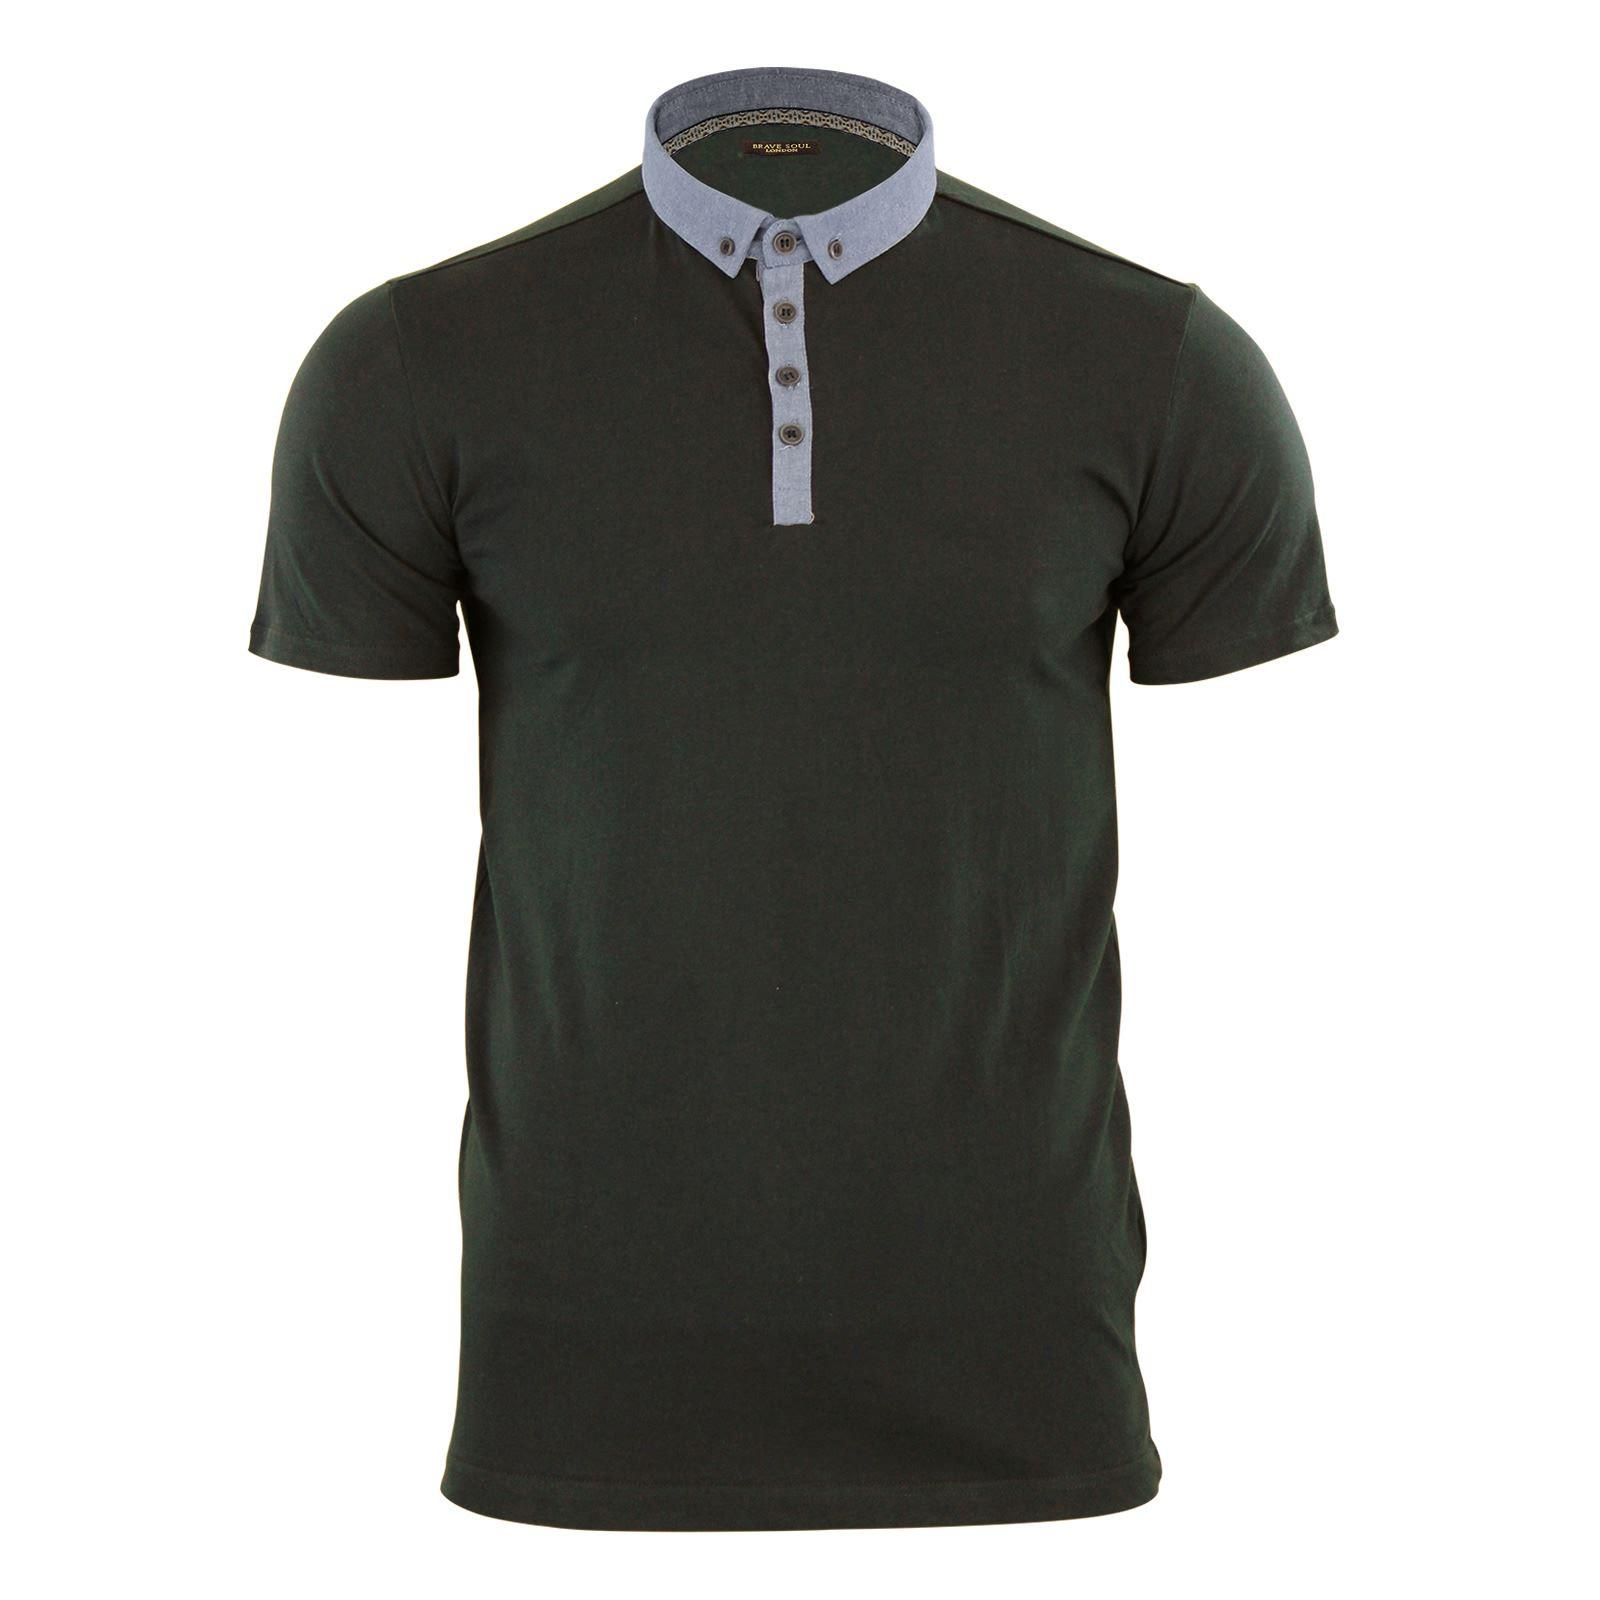 Para-Hombre-Polo-T-Shirt-Alma-valiente-Glover-Algodon-Con-Cuello-Y-Manga-Corta-Casual-Top miniatura 33